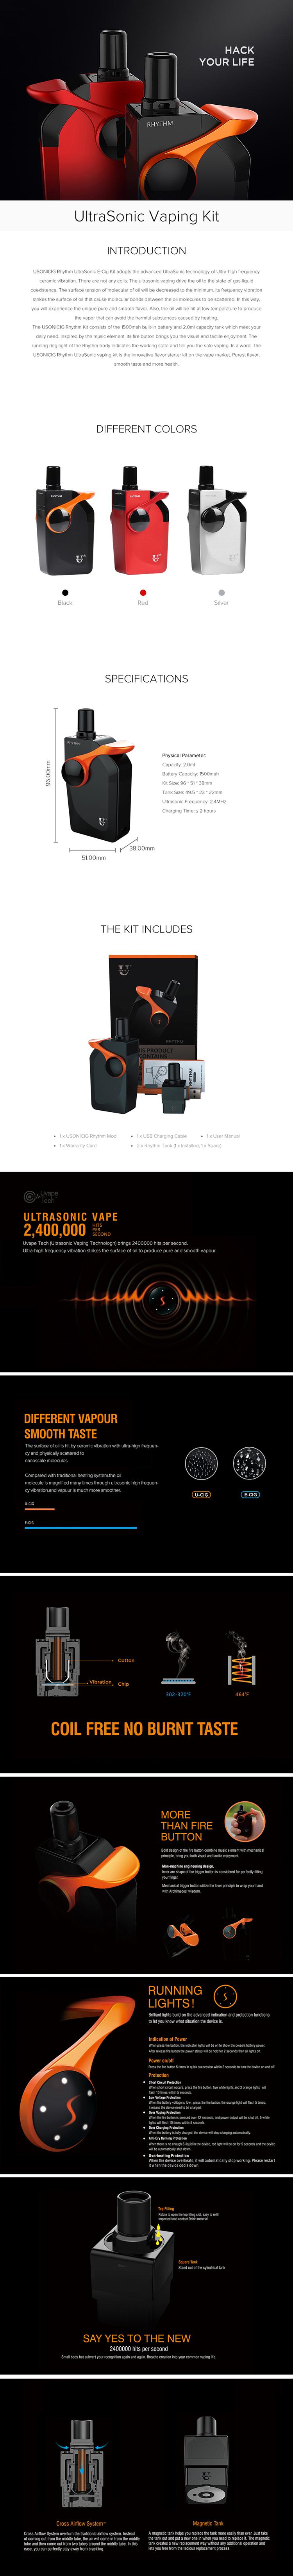 USONICIG Rhythm UltraSonic Vaping Kit